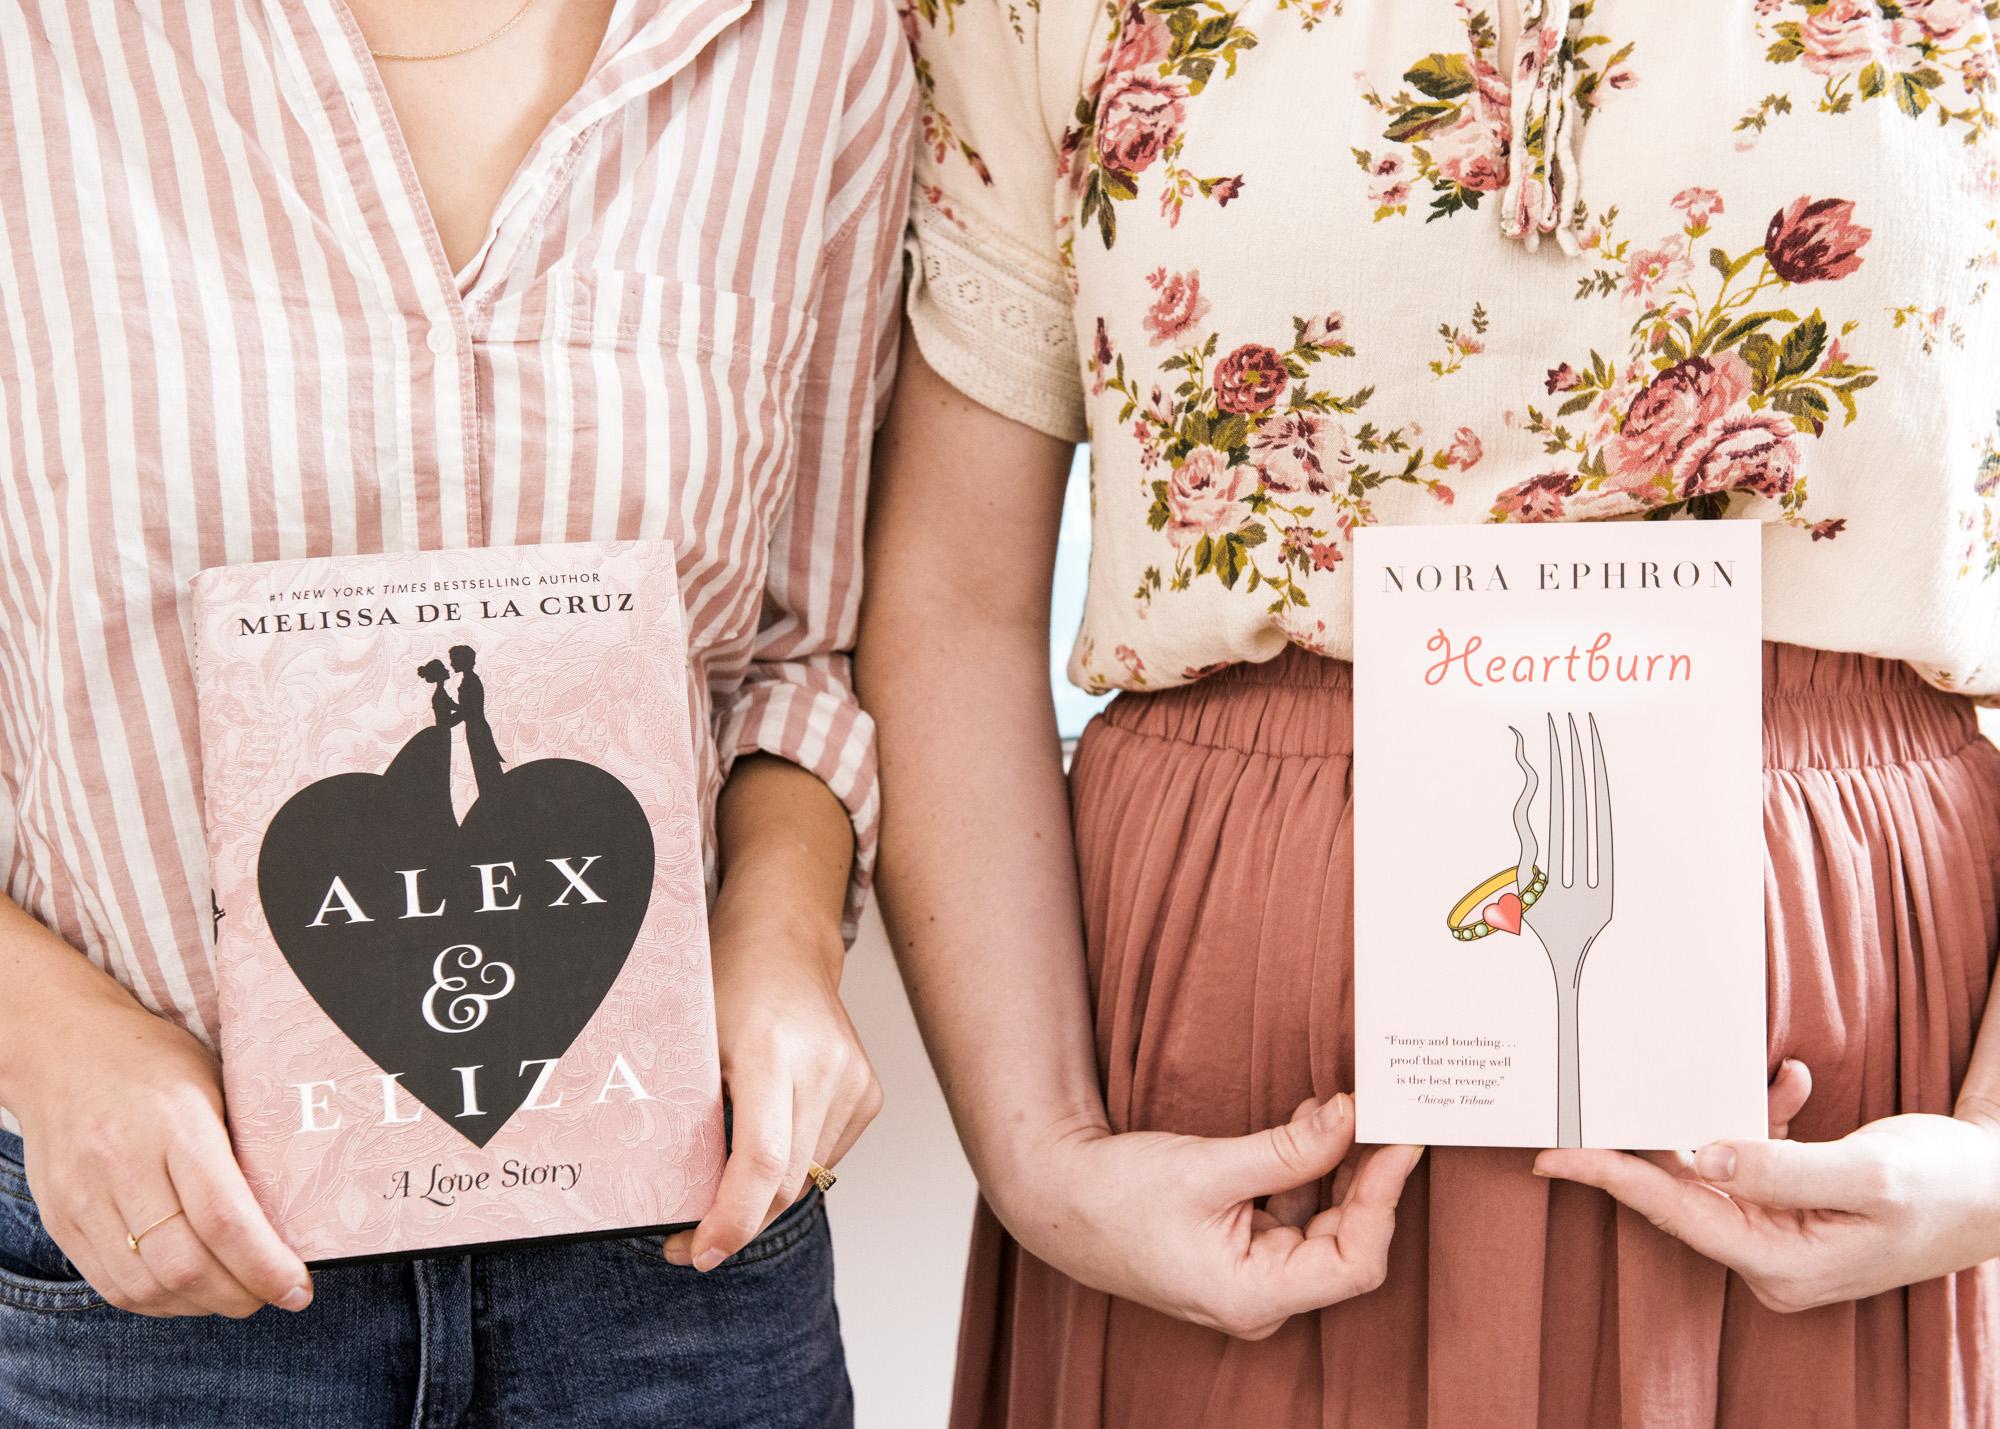 Bea (left) holding a copy of  Alex & Eliza , & Leah holding a copy of Nora Ephon's  Heartburn